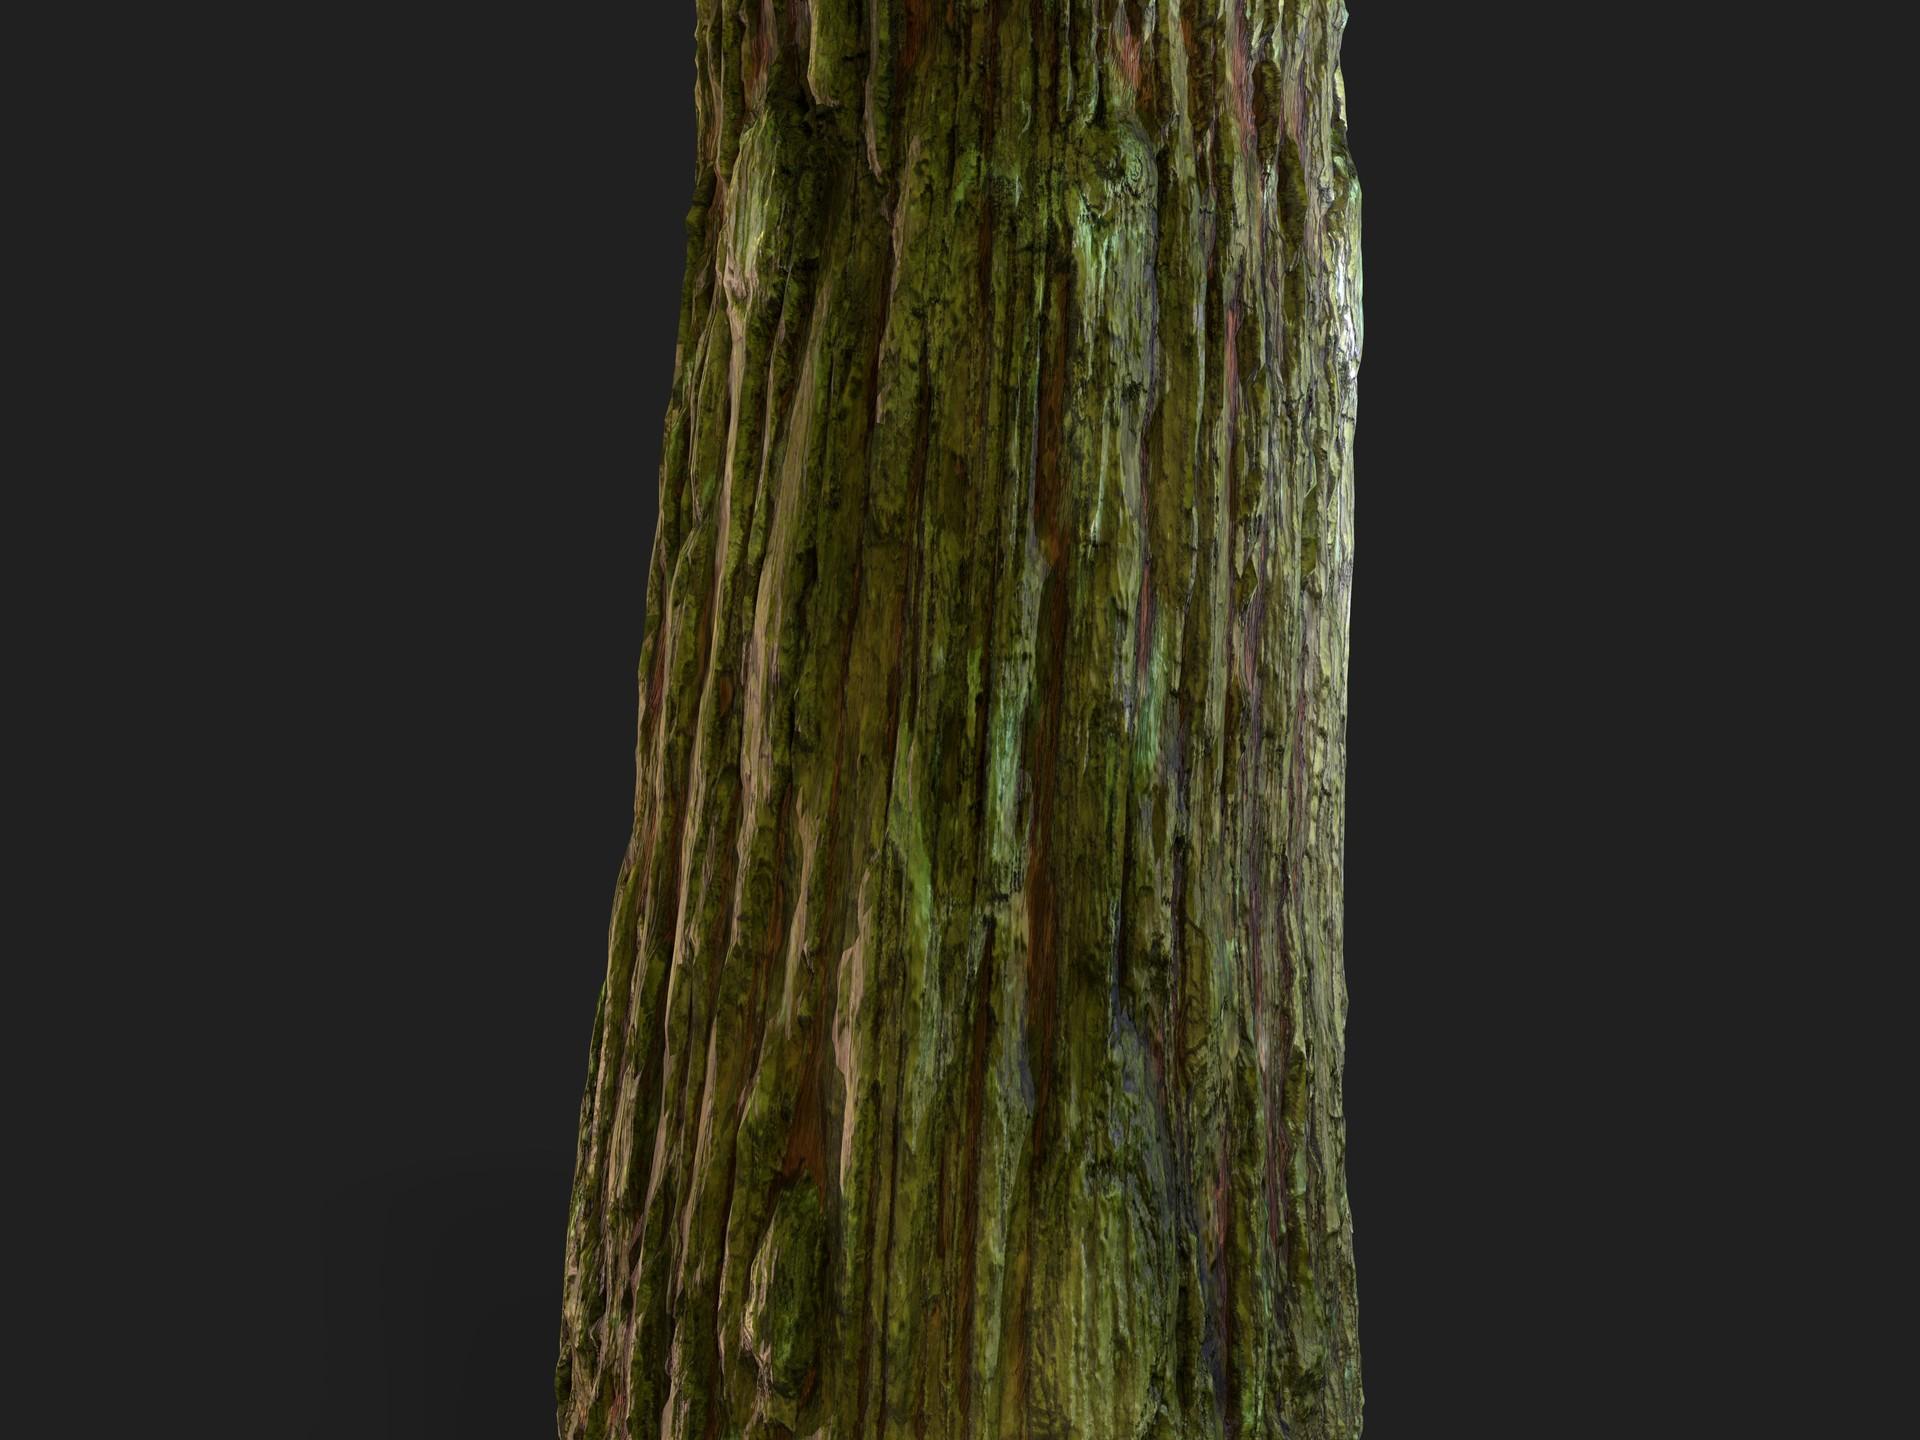 Martin pietras bark 02